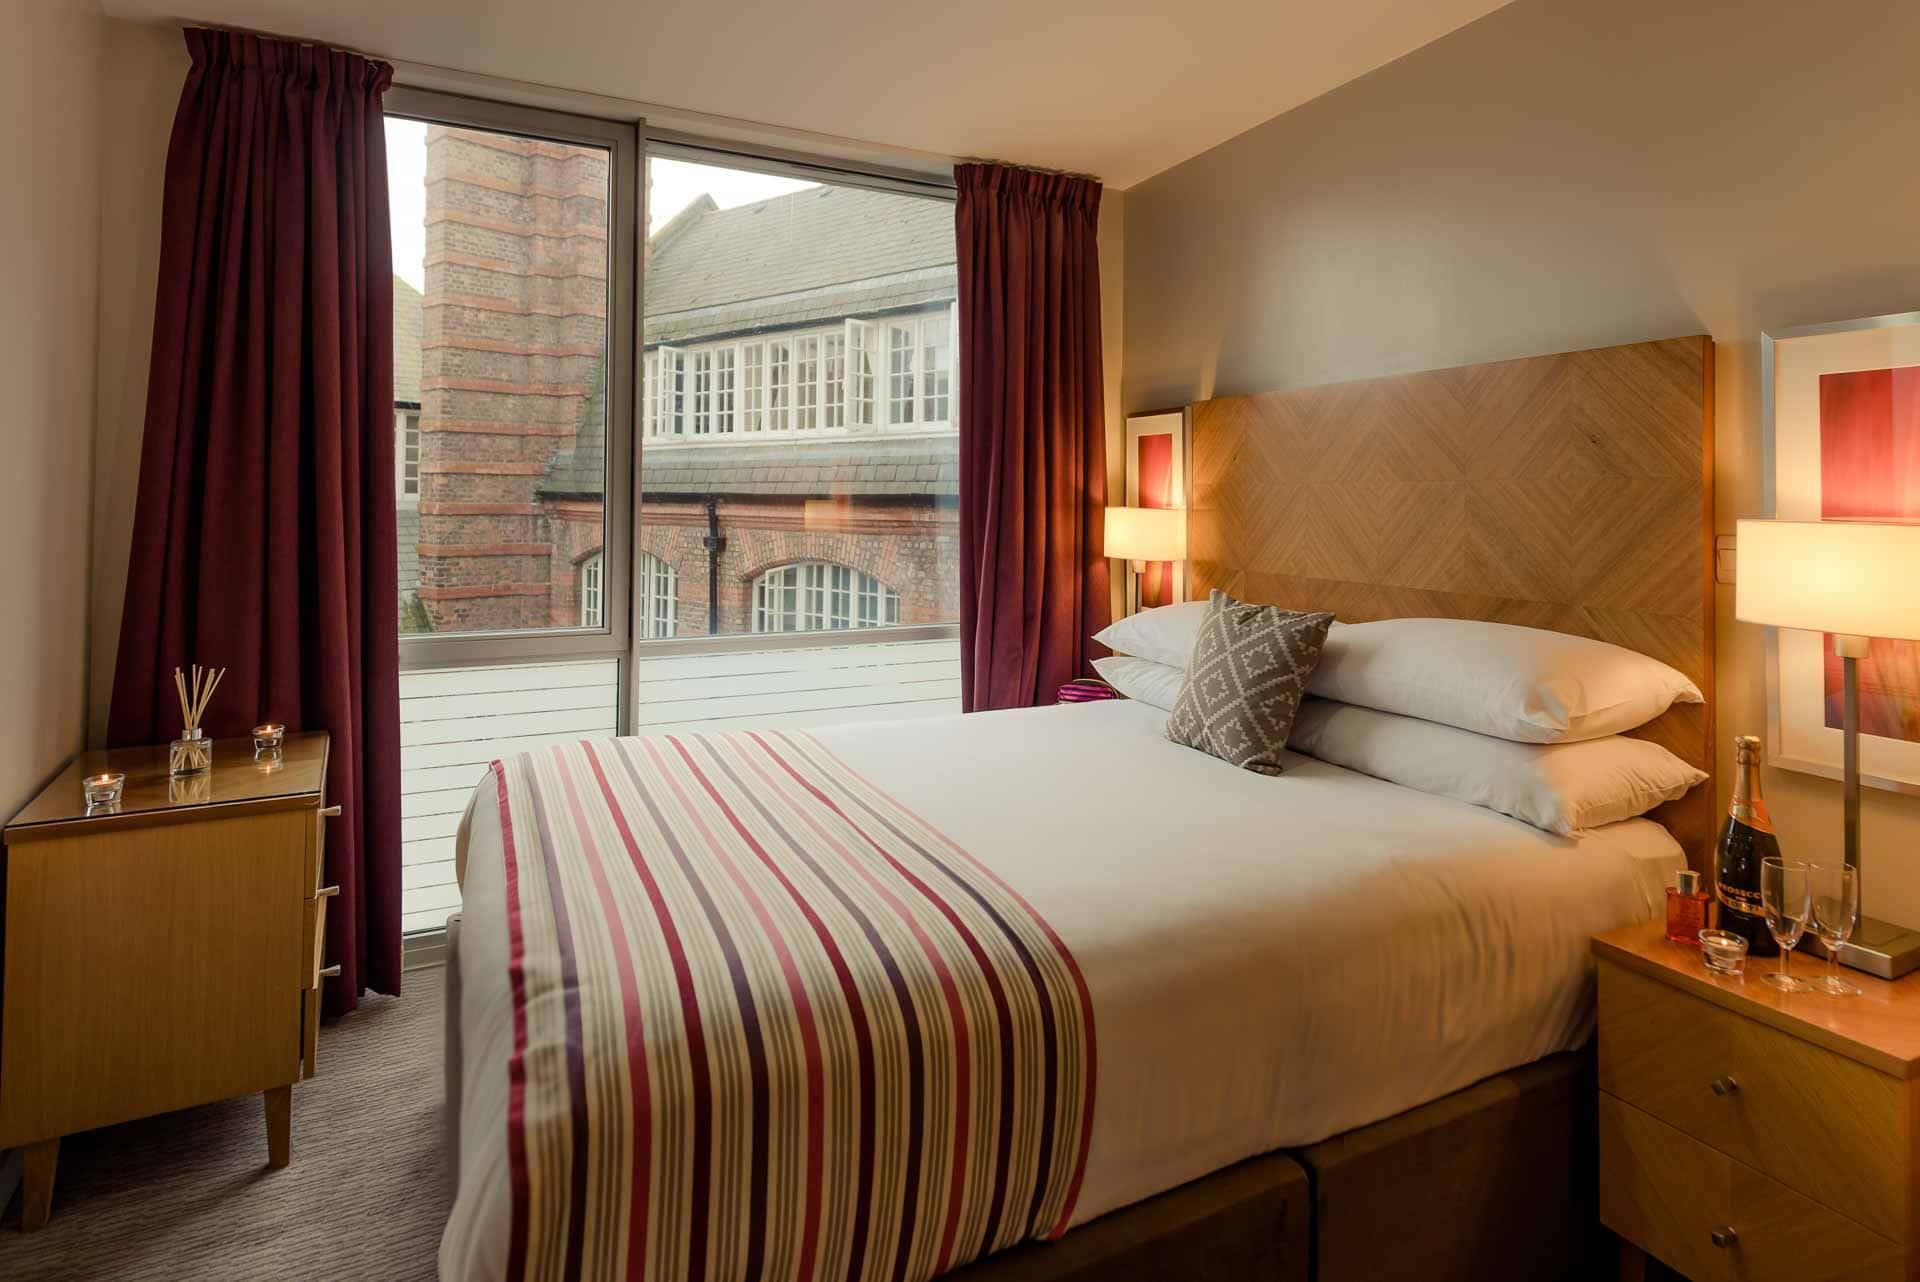 Double bedroom at Premier Suites Liverpool, Centre, Liverpool - Citybase Apartments